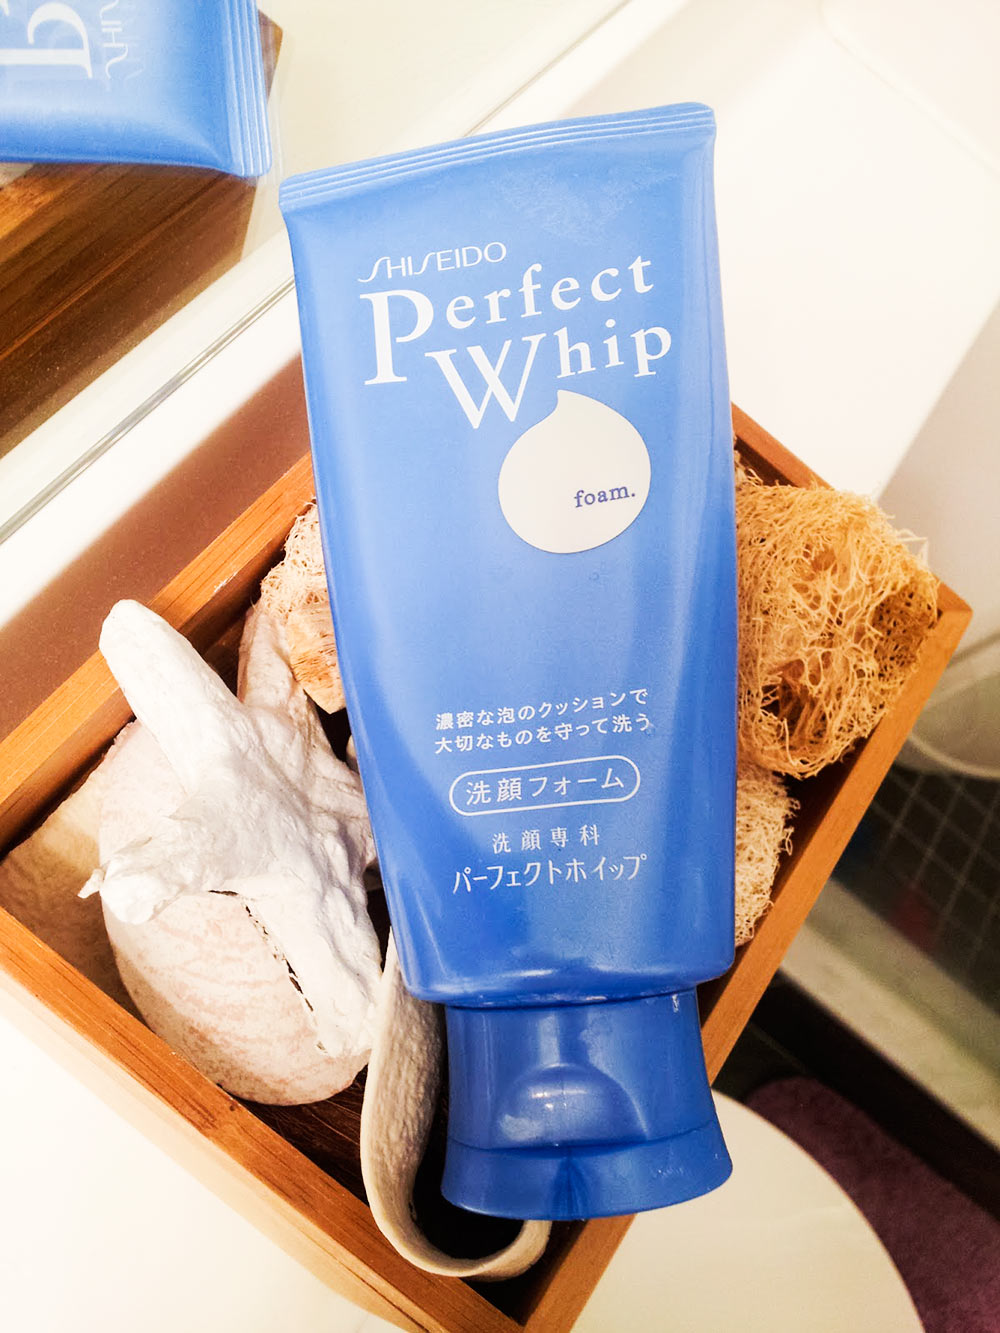 sữa rửa mặt Shiseido